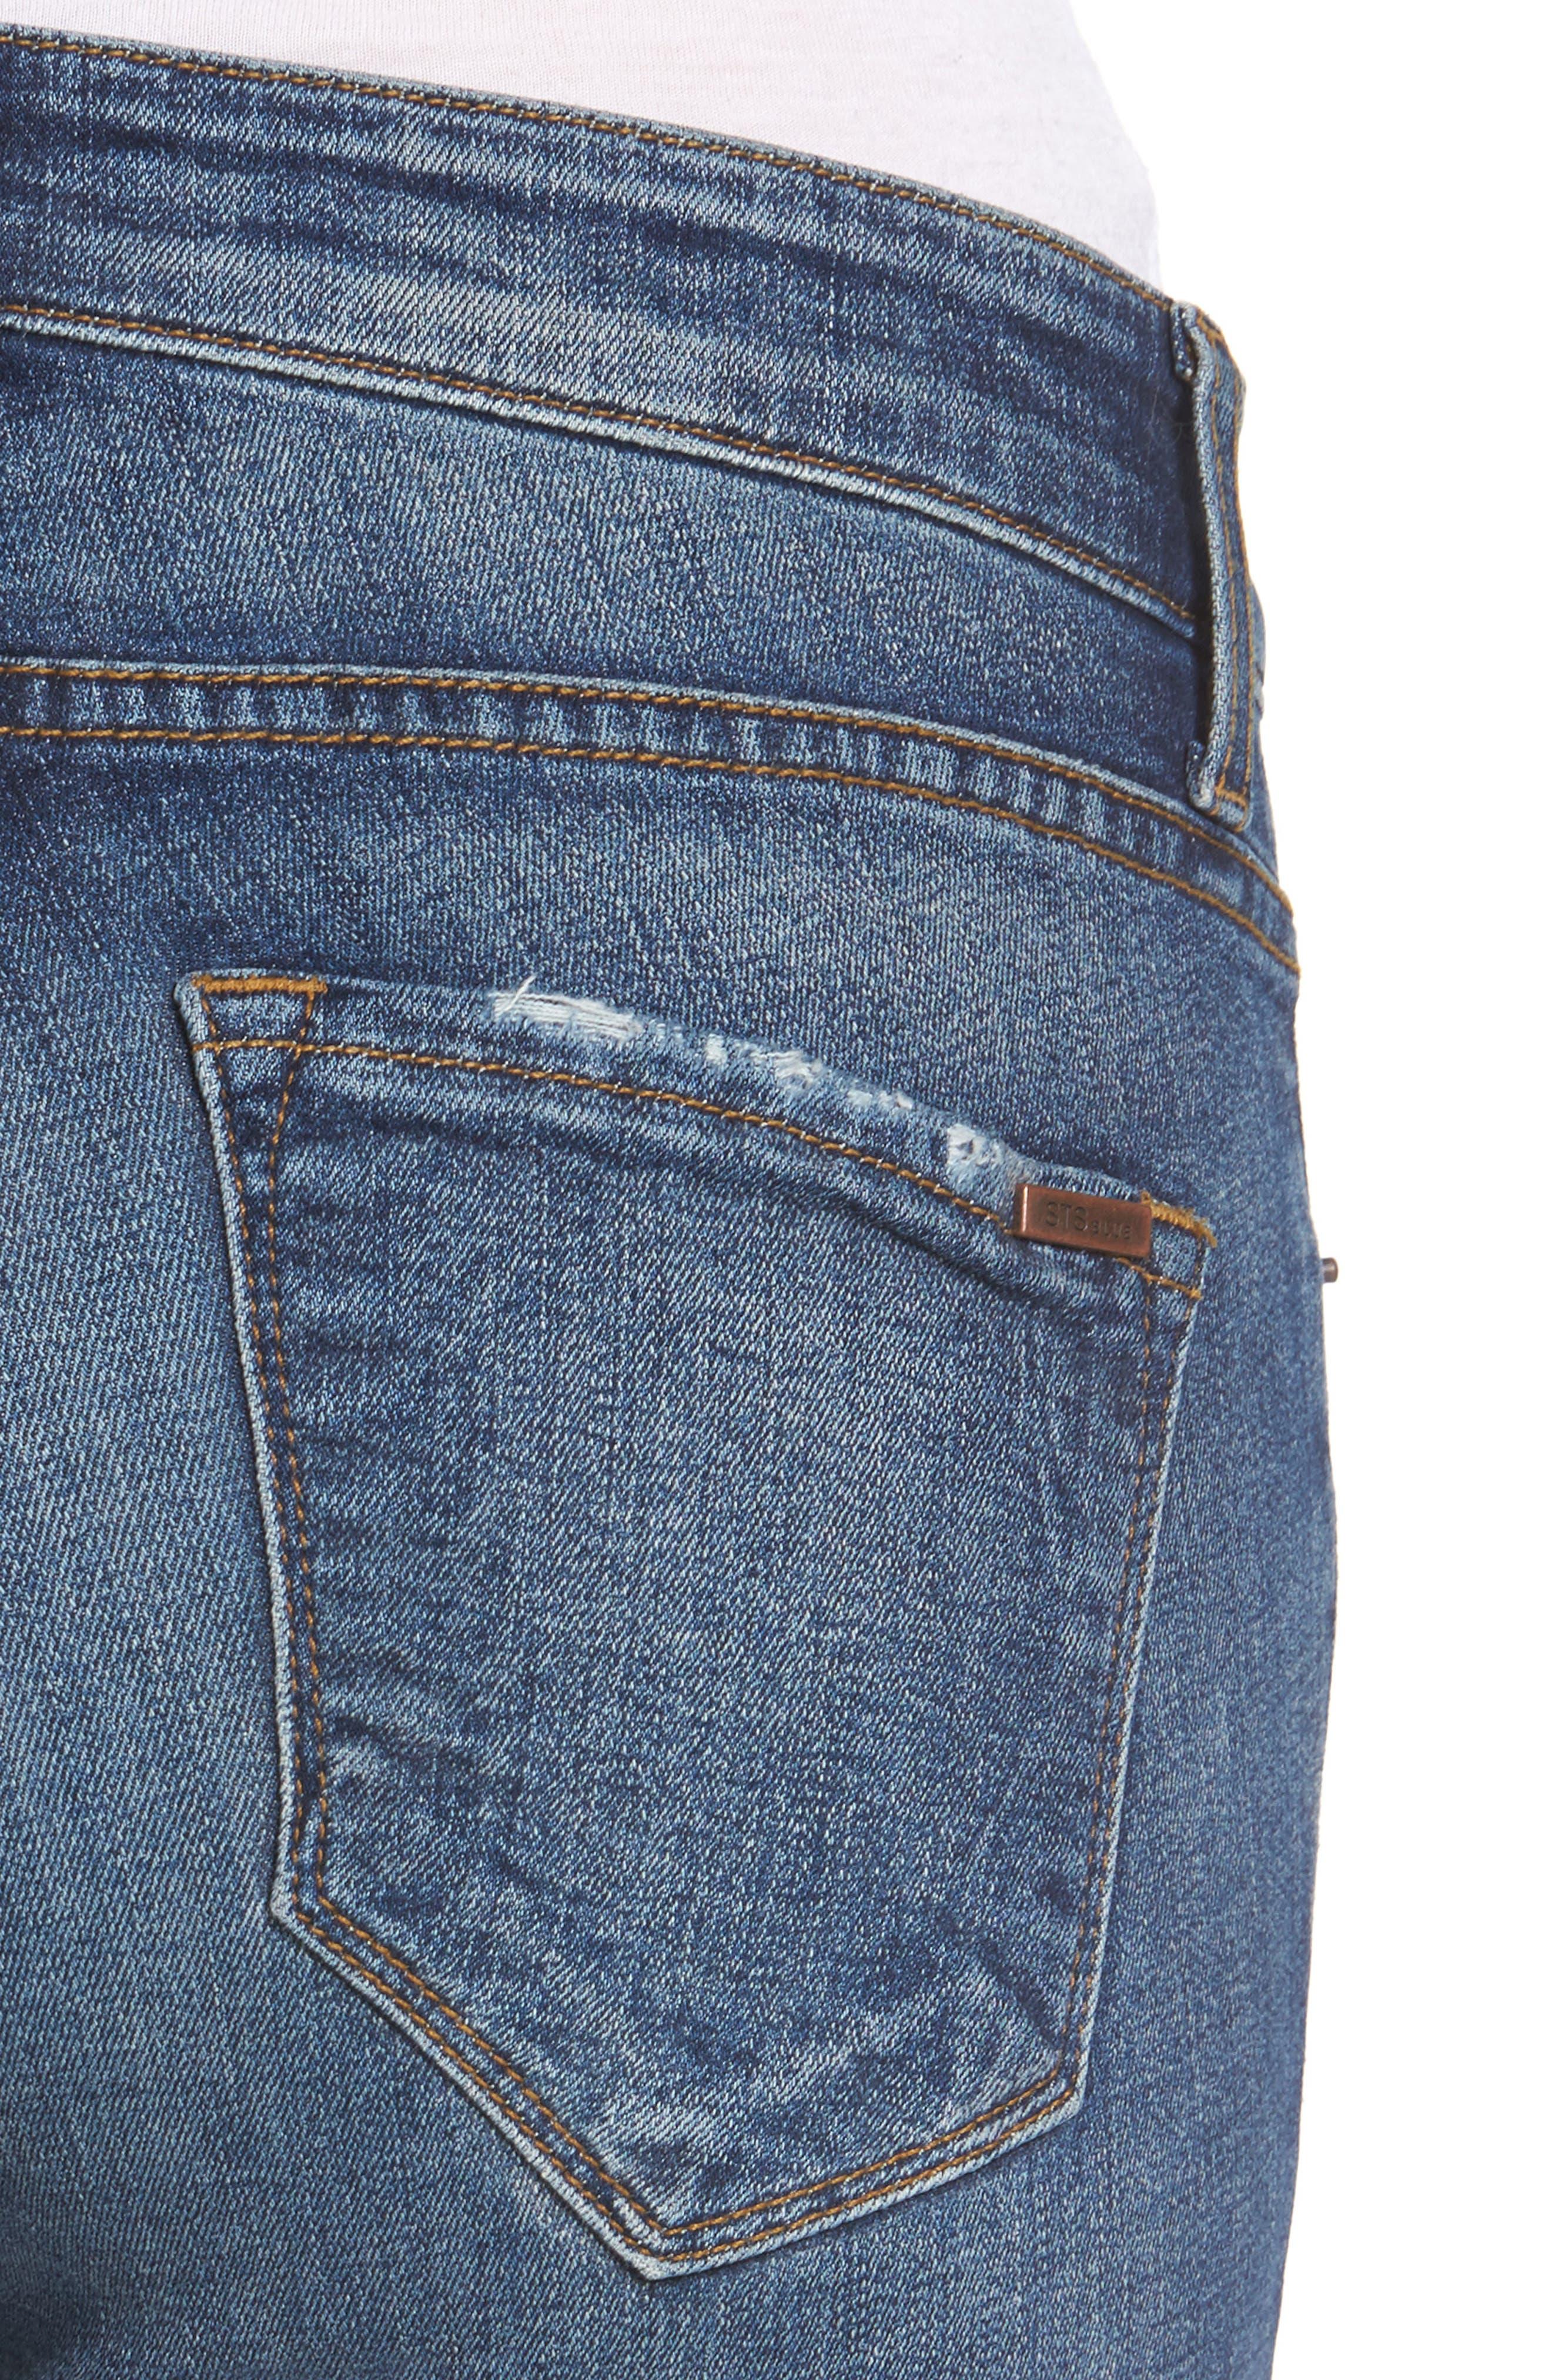 Taylor Tomboy Ripped Boyfriend Jeans,                             Alternate thumbnail 4, color,                             400